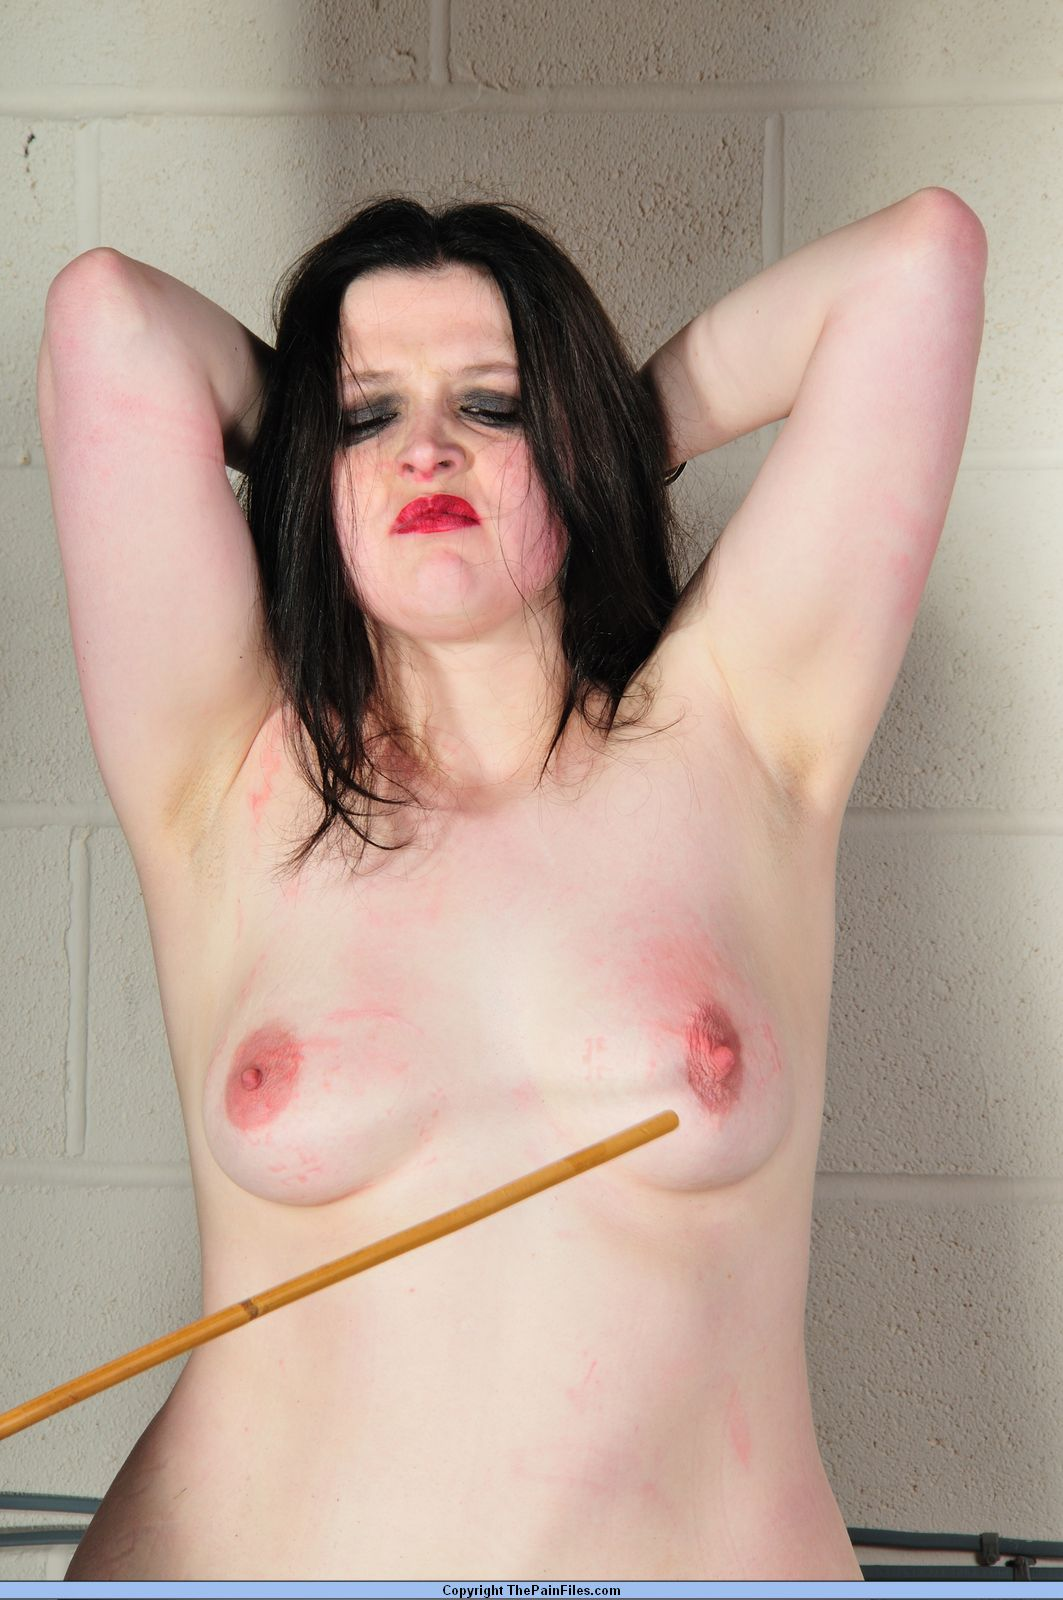 Tiffany thompson hot nude pinterest